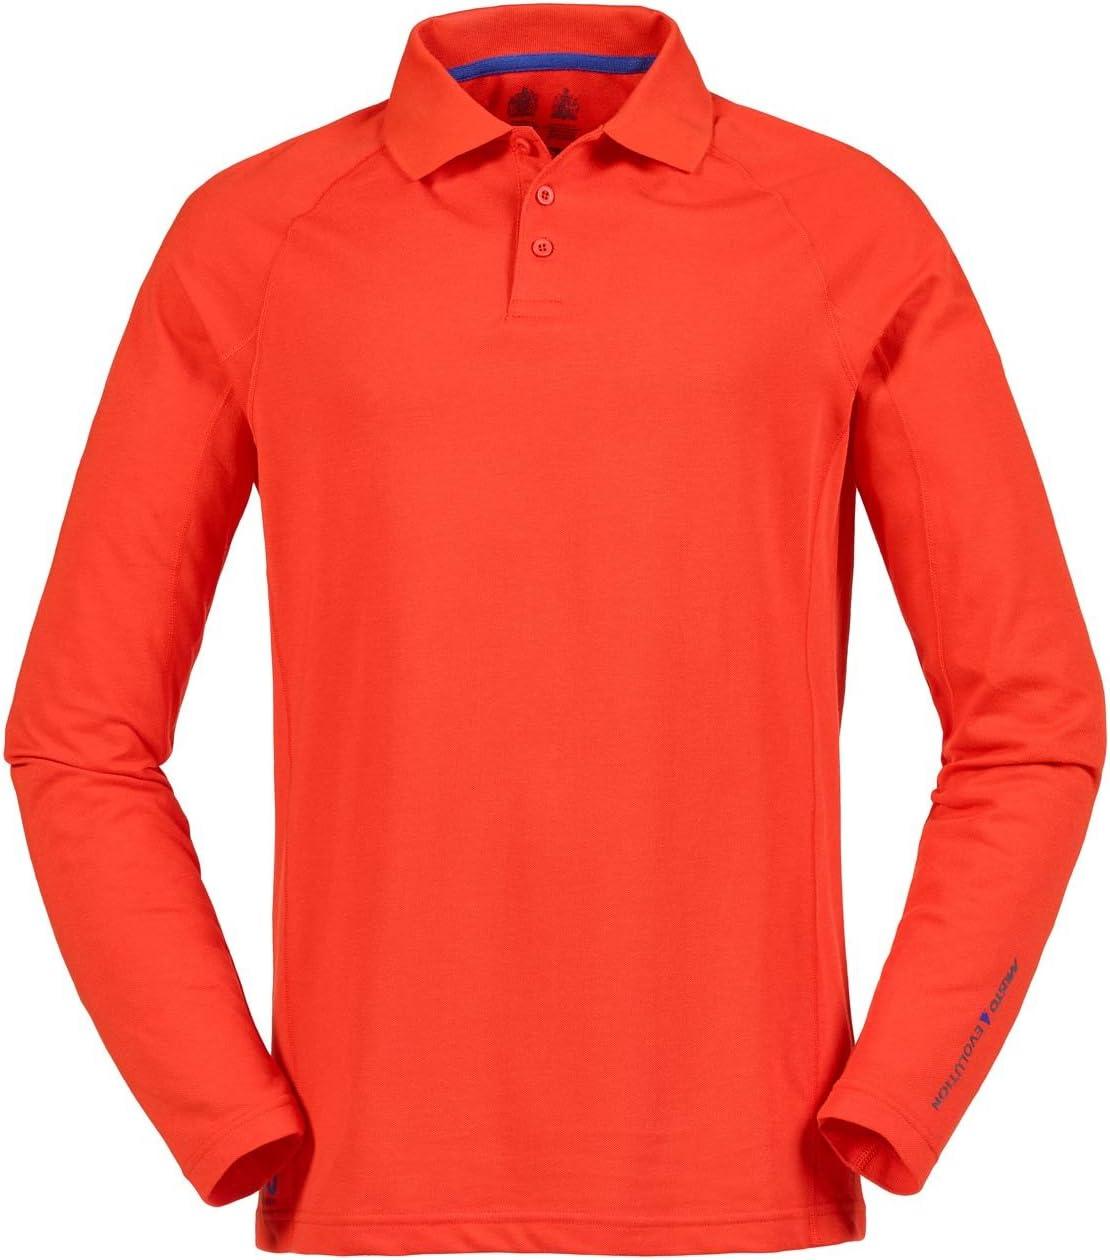 2016 Musto Evolution Sunblock Long Sleeve Polo Top Fire Orange ...